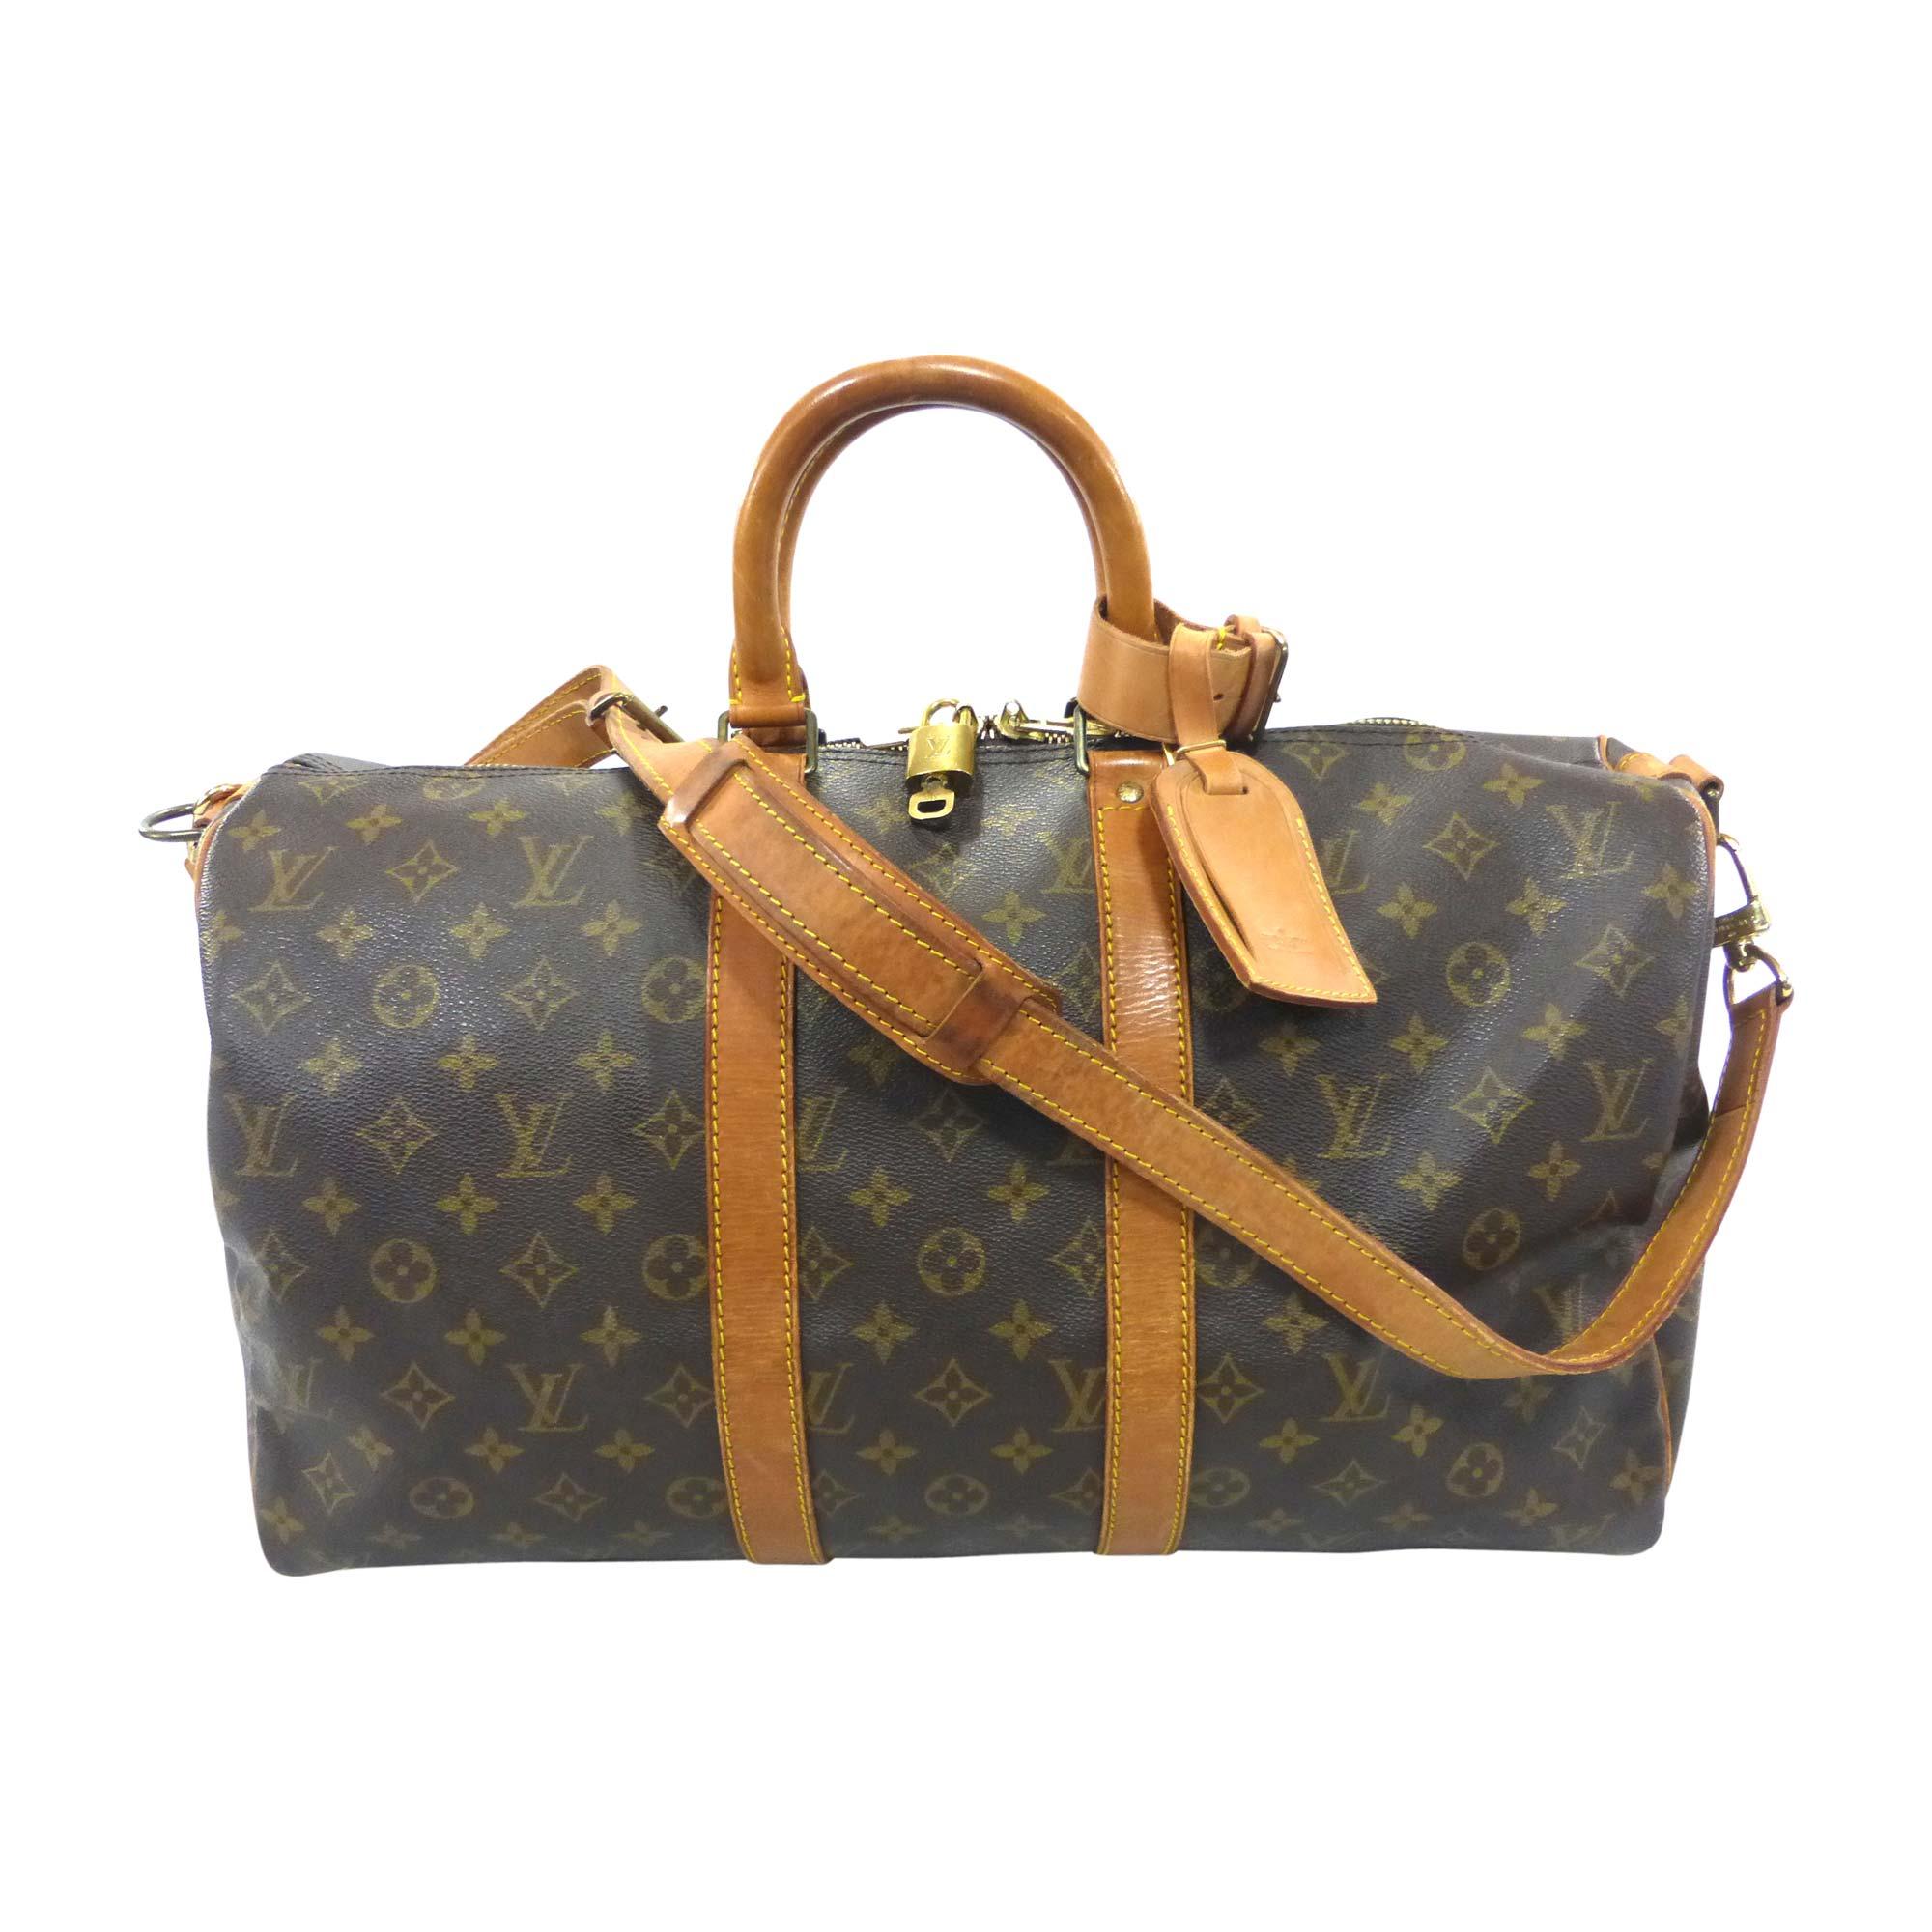 Sac XL en cuir LOUIS VUITTON keepall marron vendu par Bibag - 7208833 ee3a2de7ed6